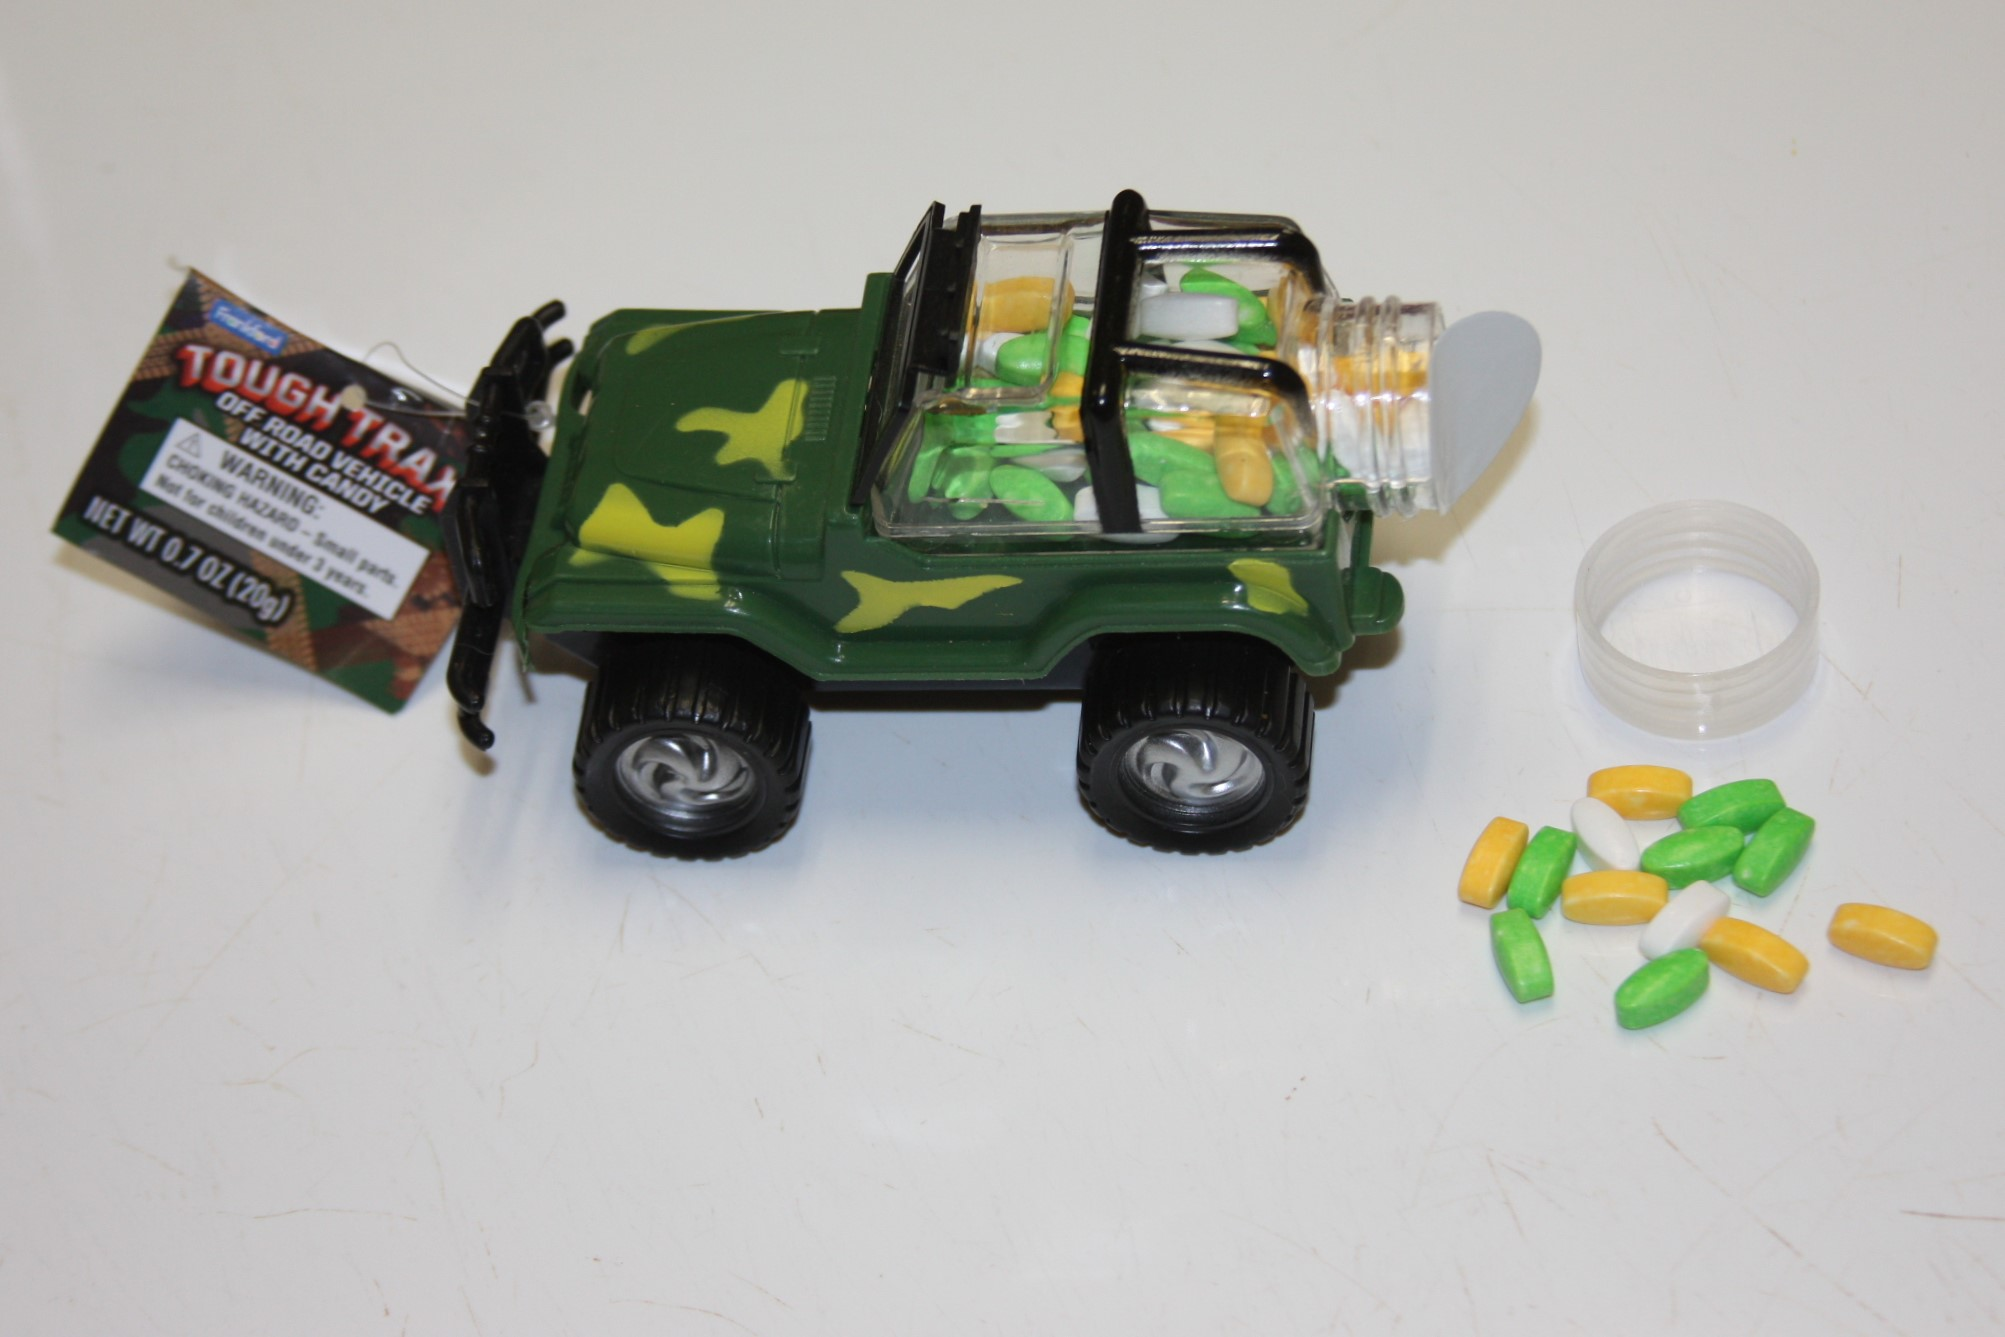 Toy Promotes Drug Use to Pre-School Children